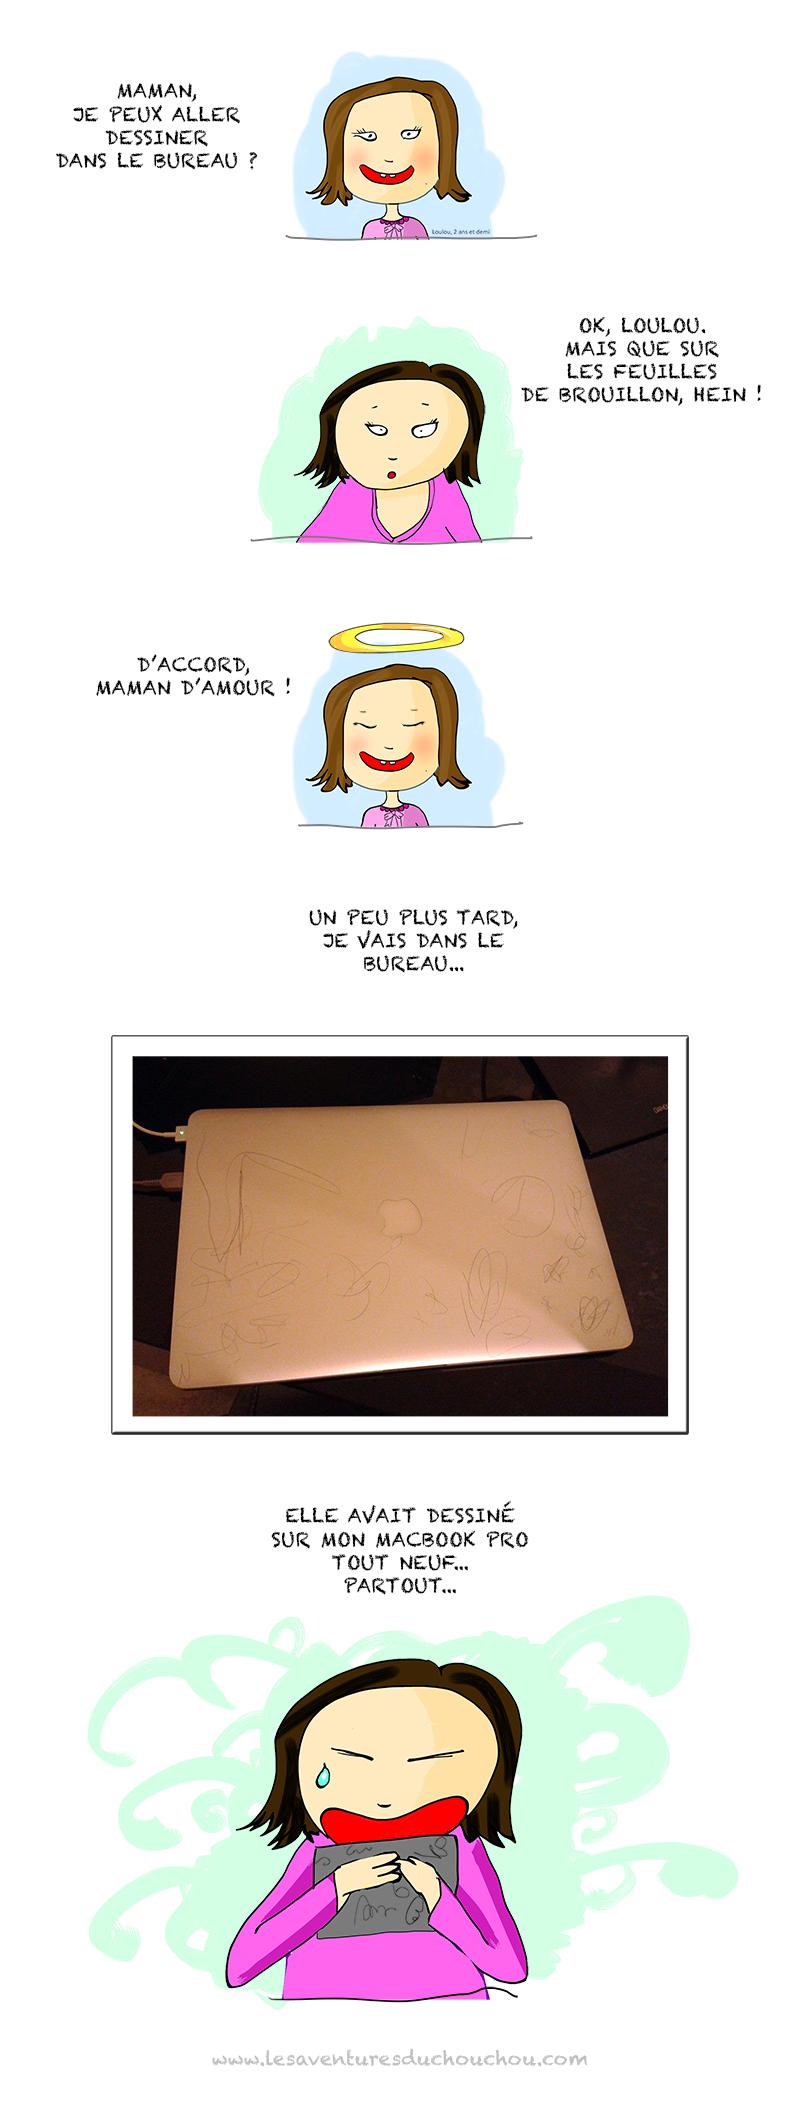 MacbookPro gribouillé